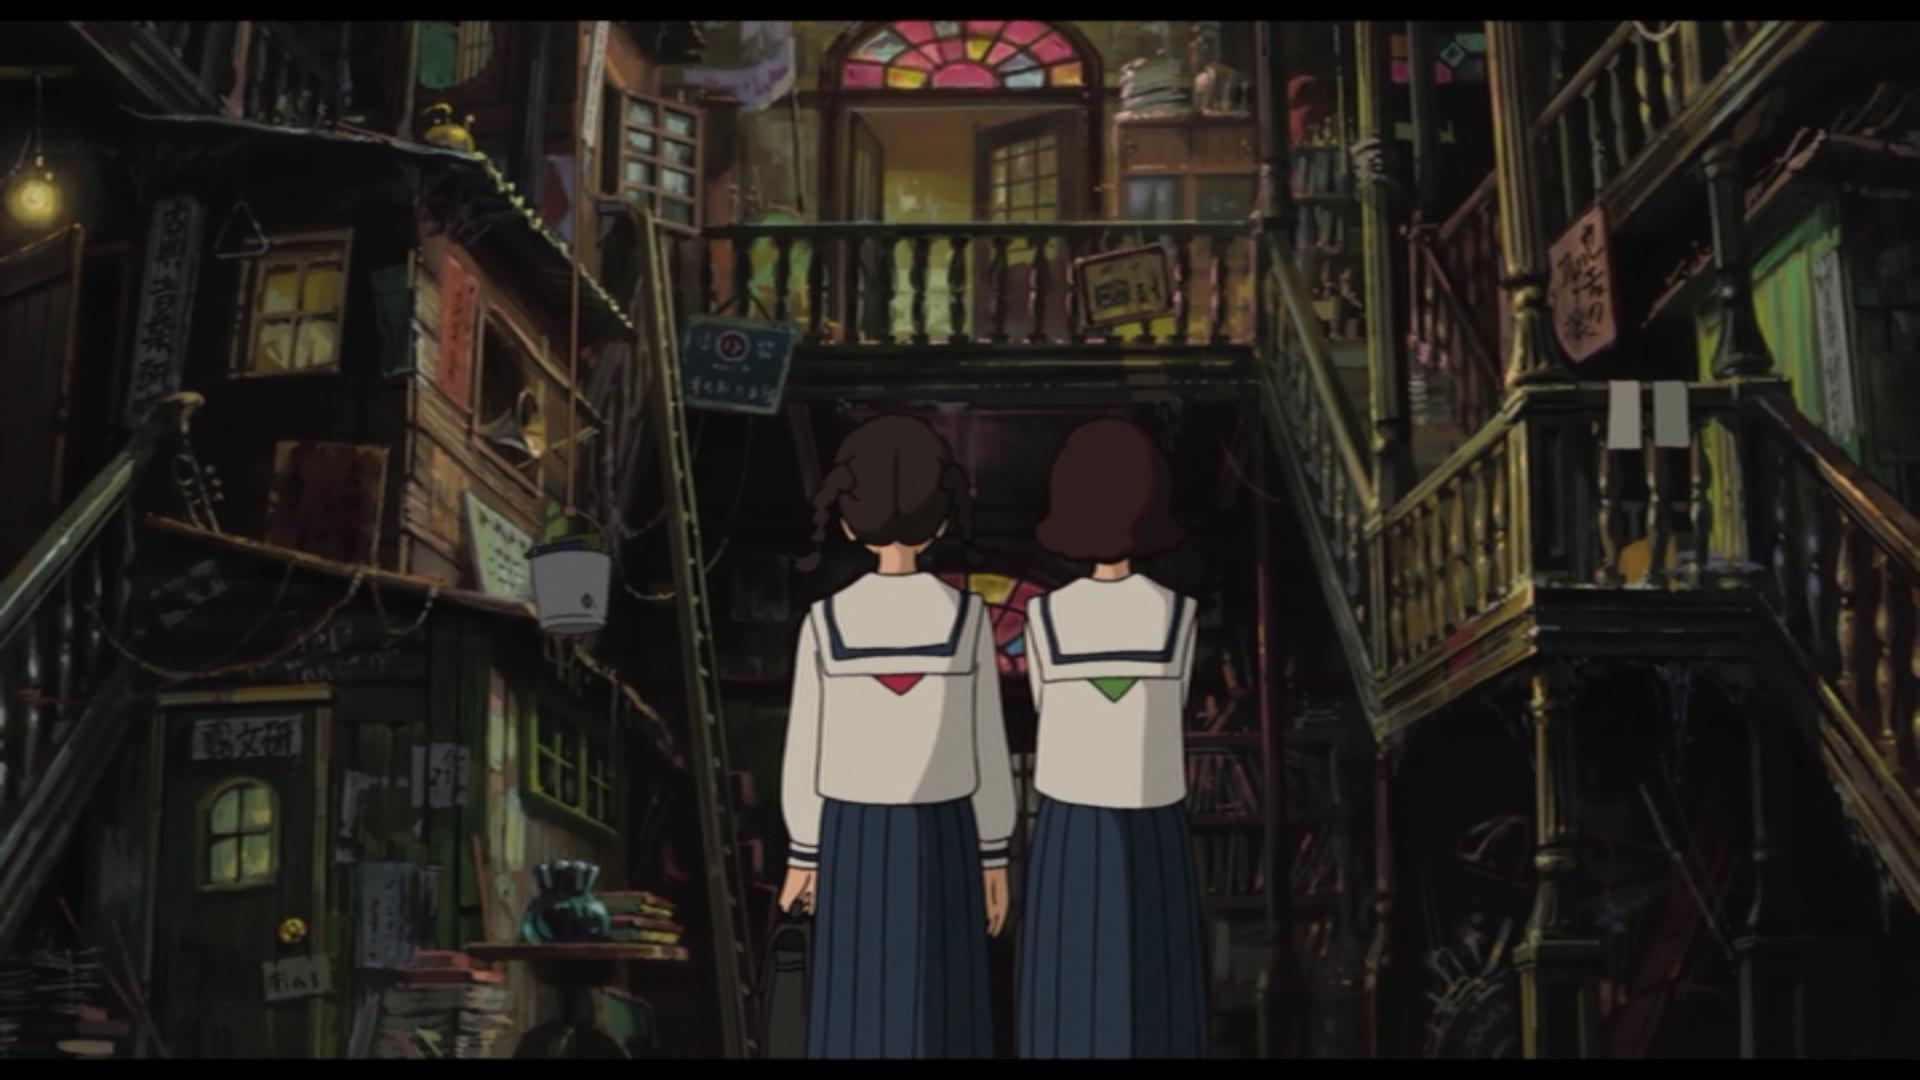 3d Orchid Wallpaper Reviews News Anime Uk Anime And Manga